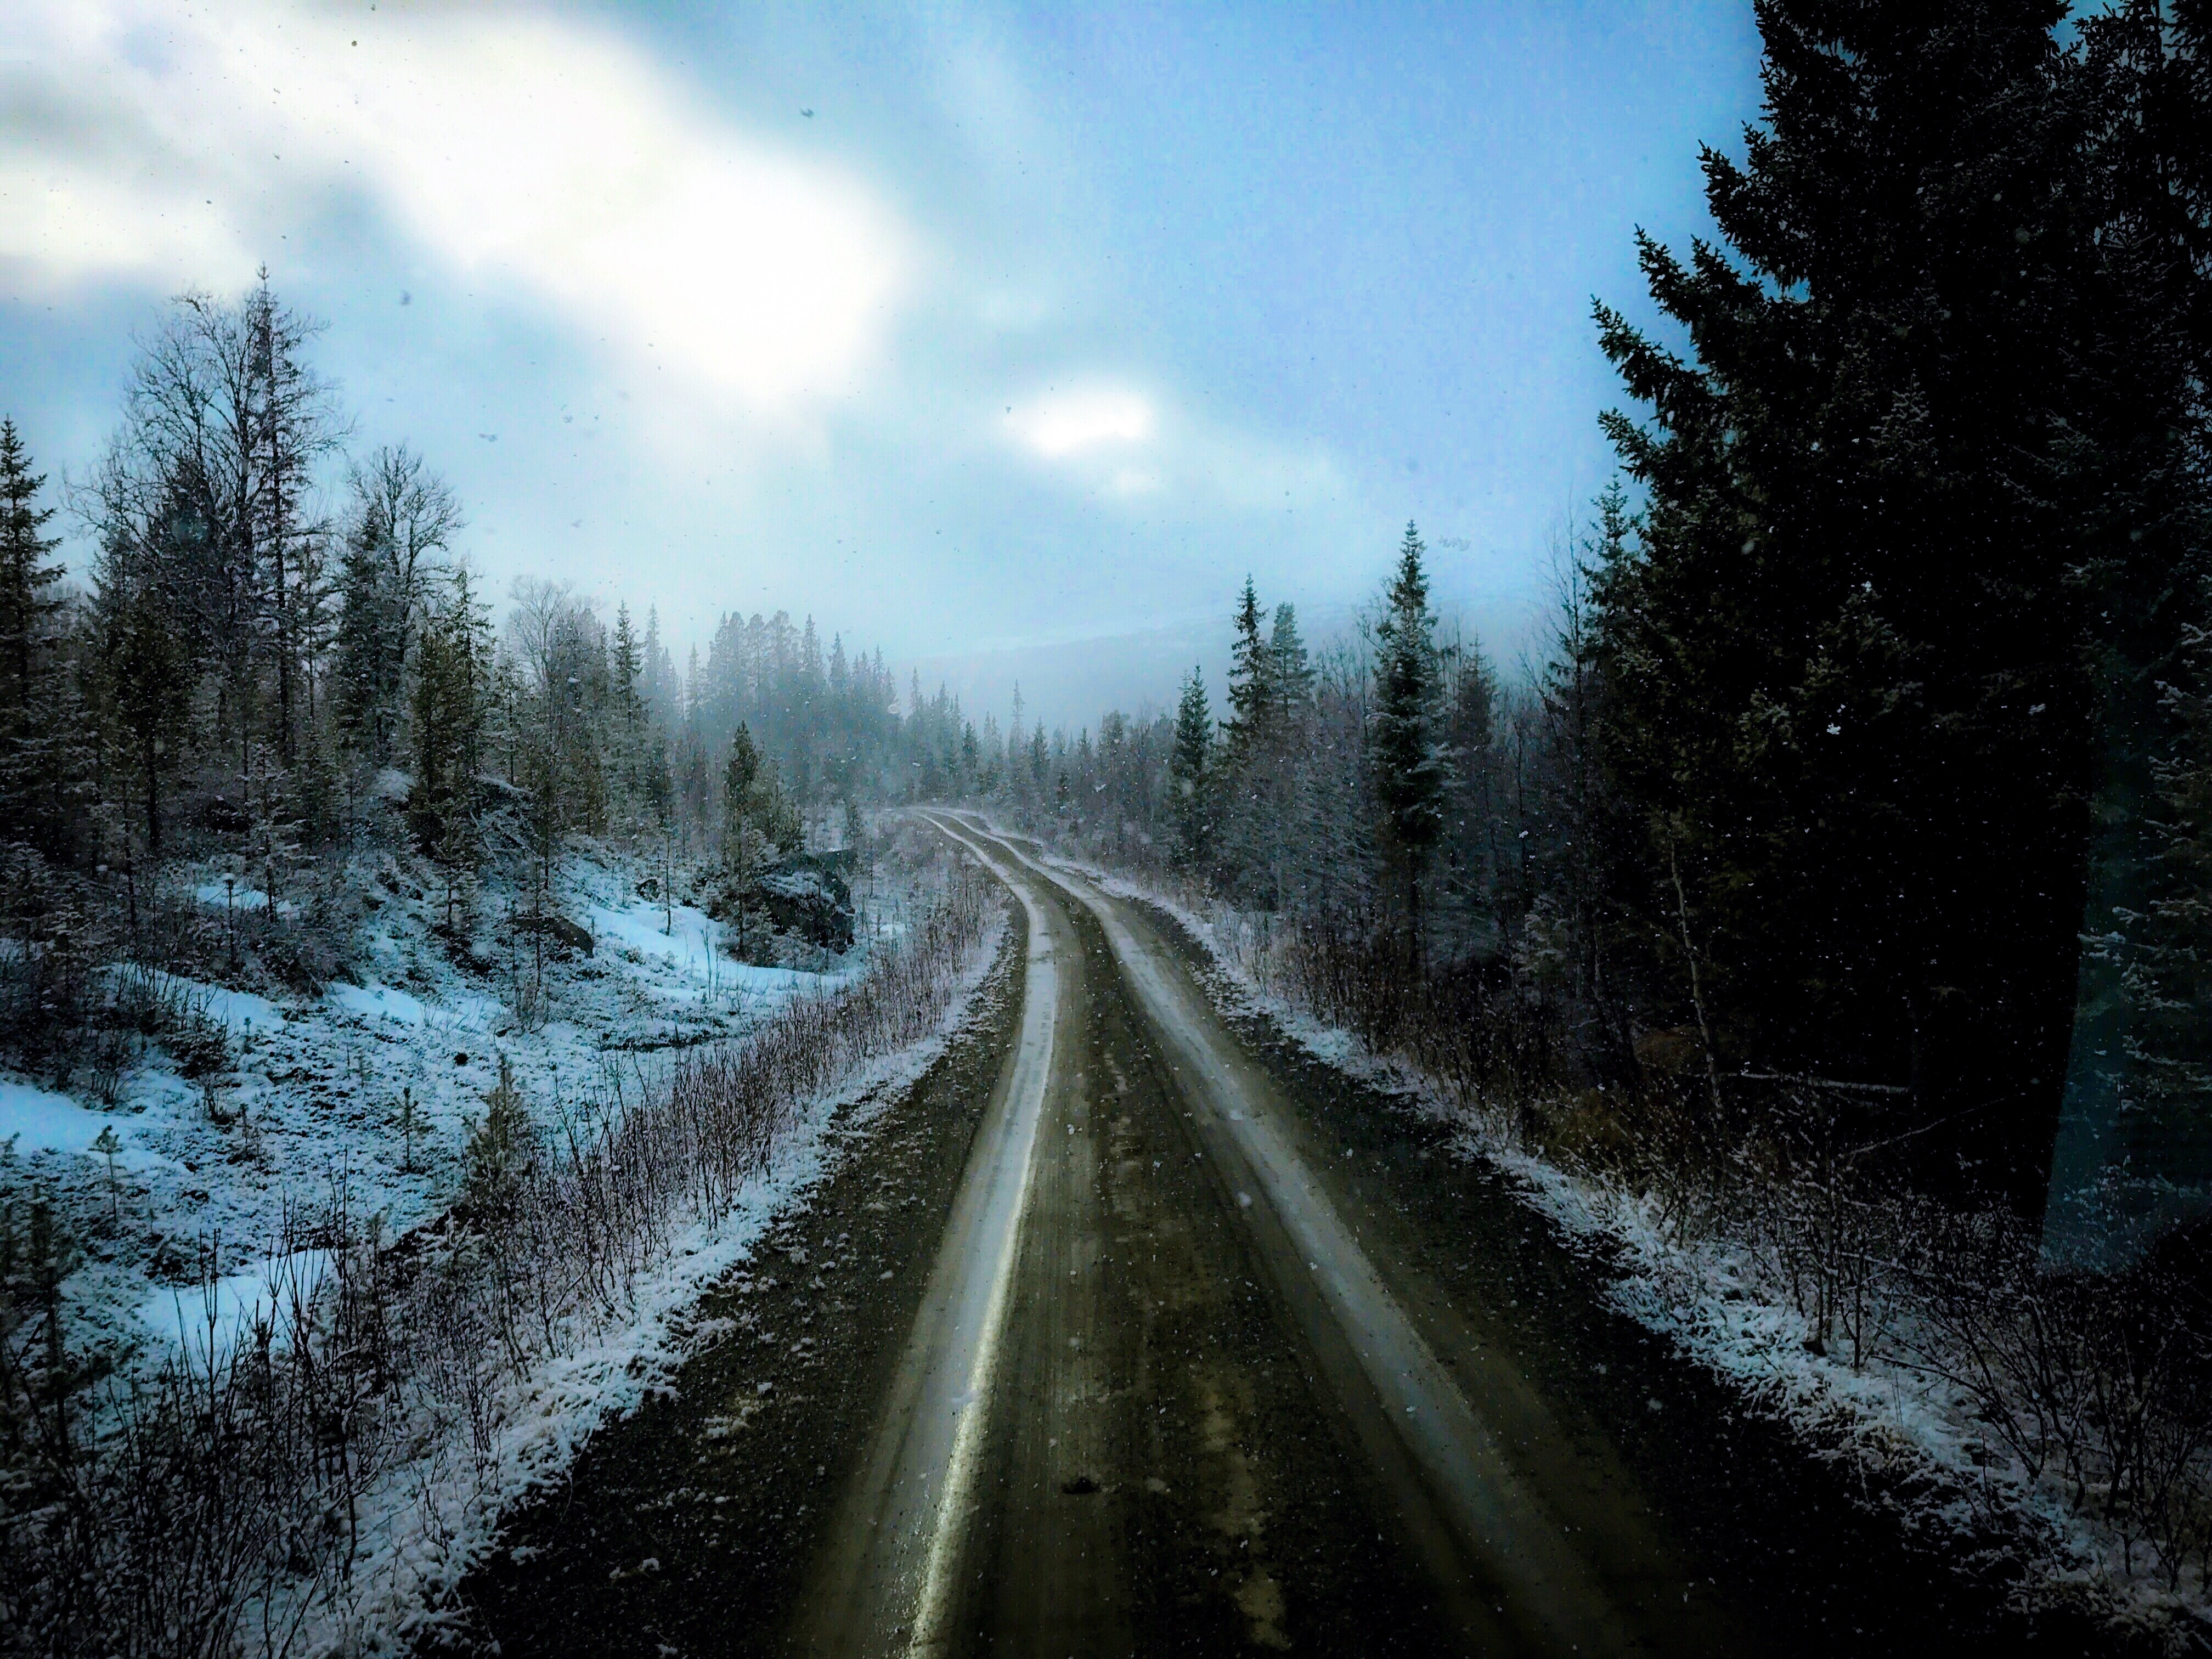 Swedish road through the mountains